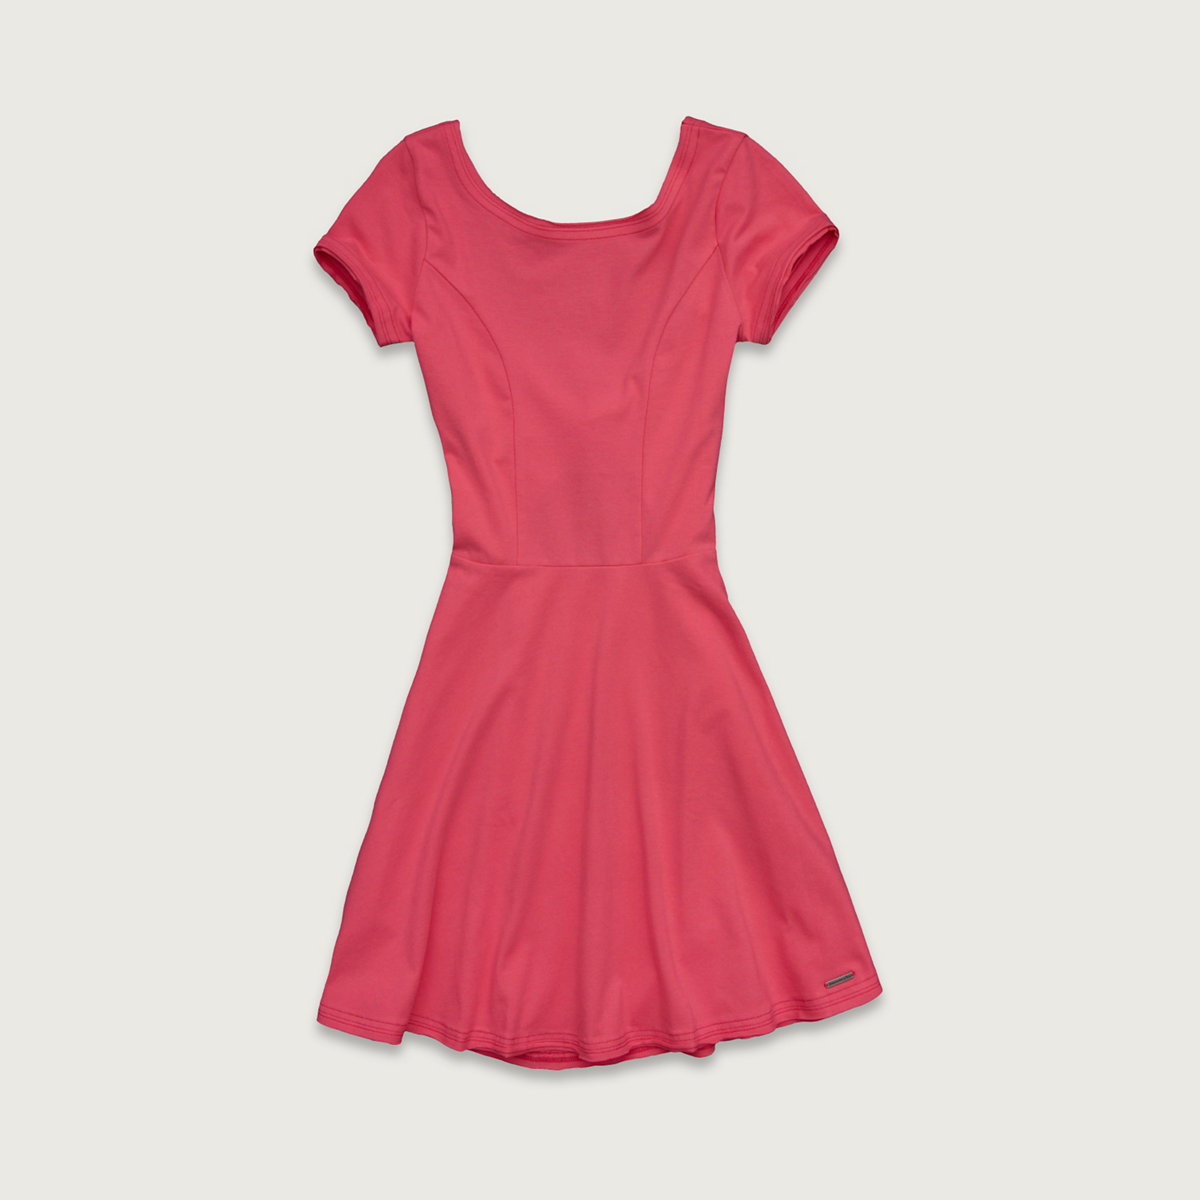 Macey Knit Skater Dress